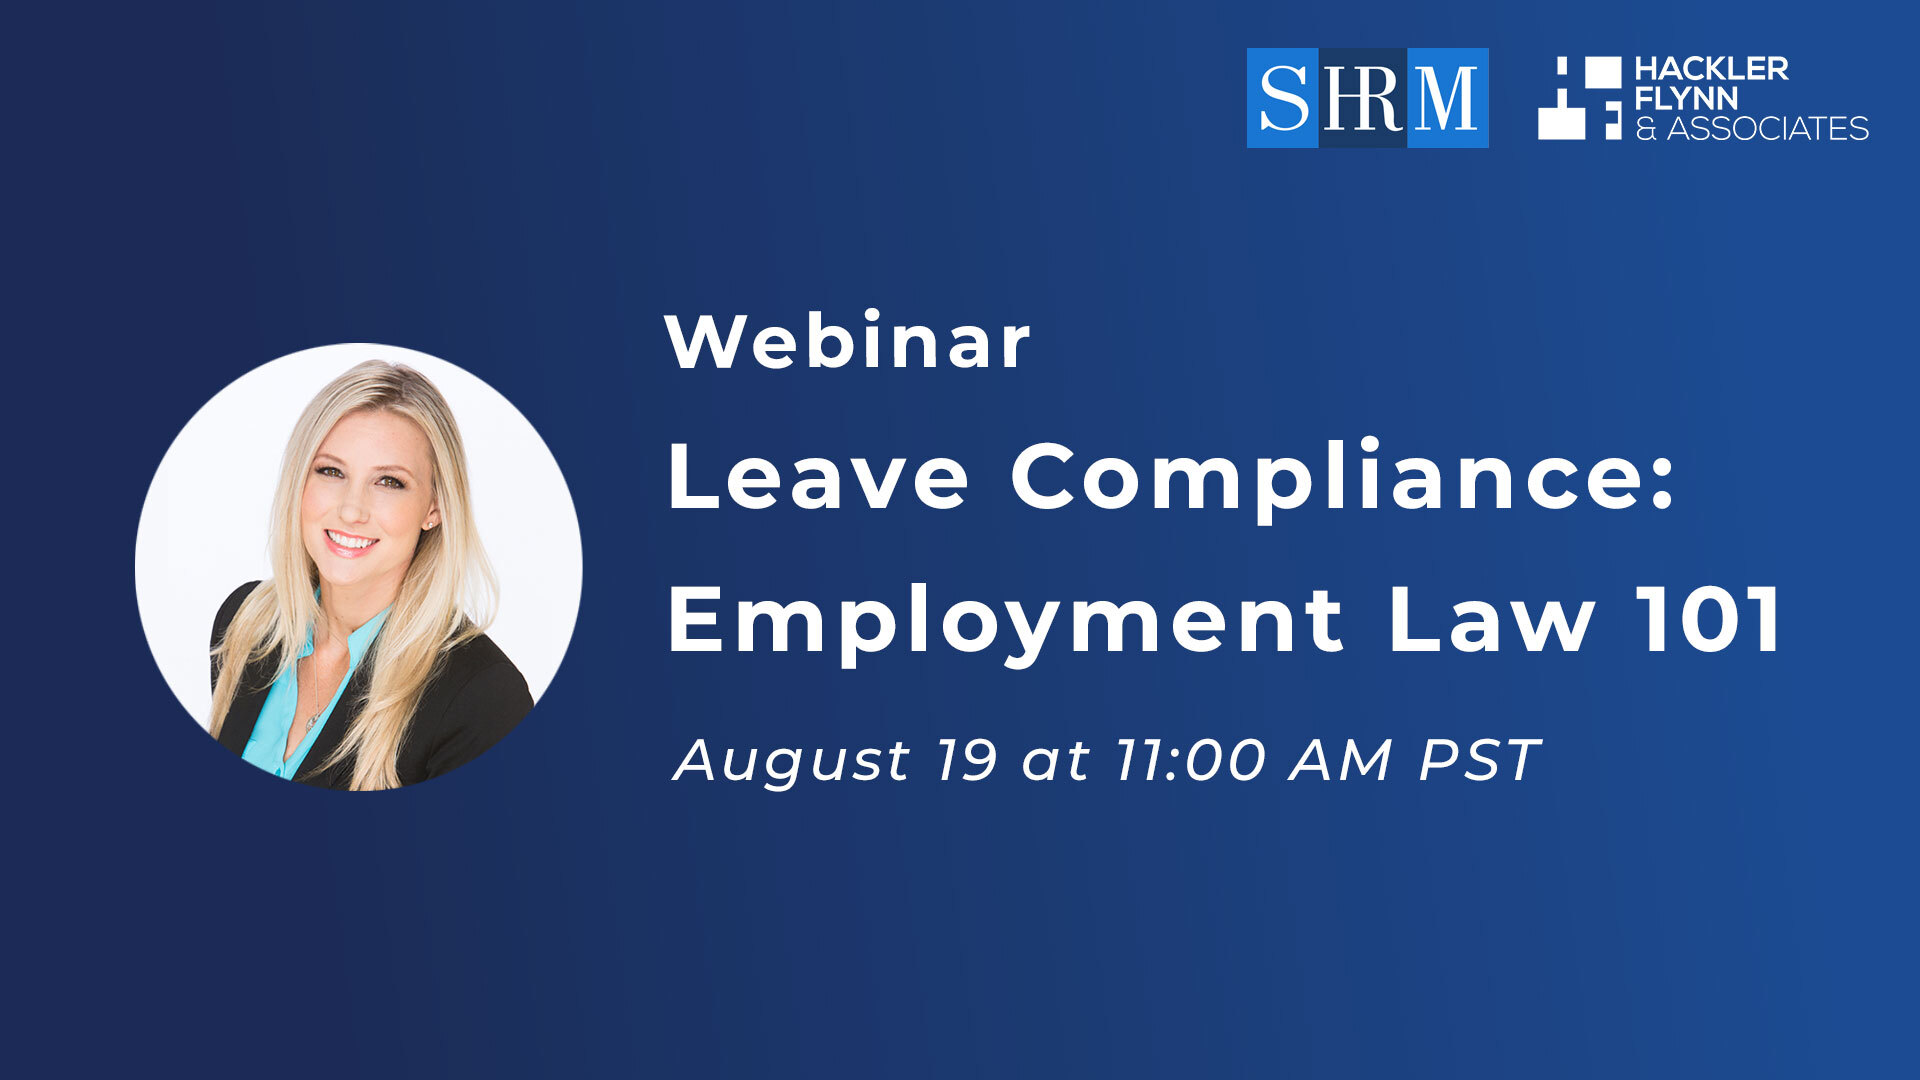 Leave Compliance SHRM Webinar